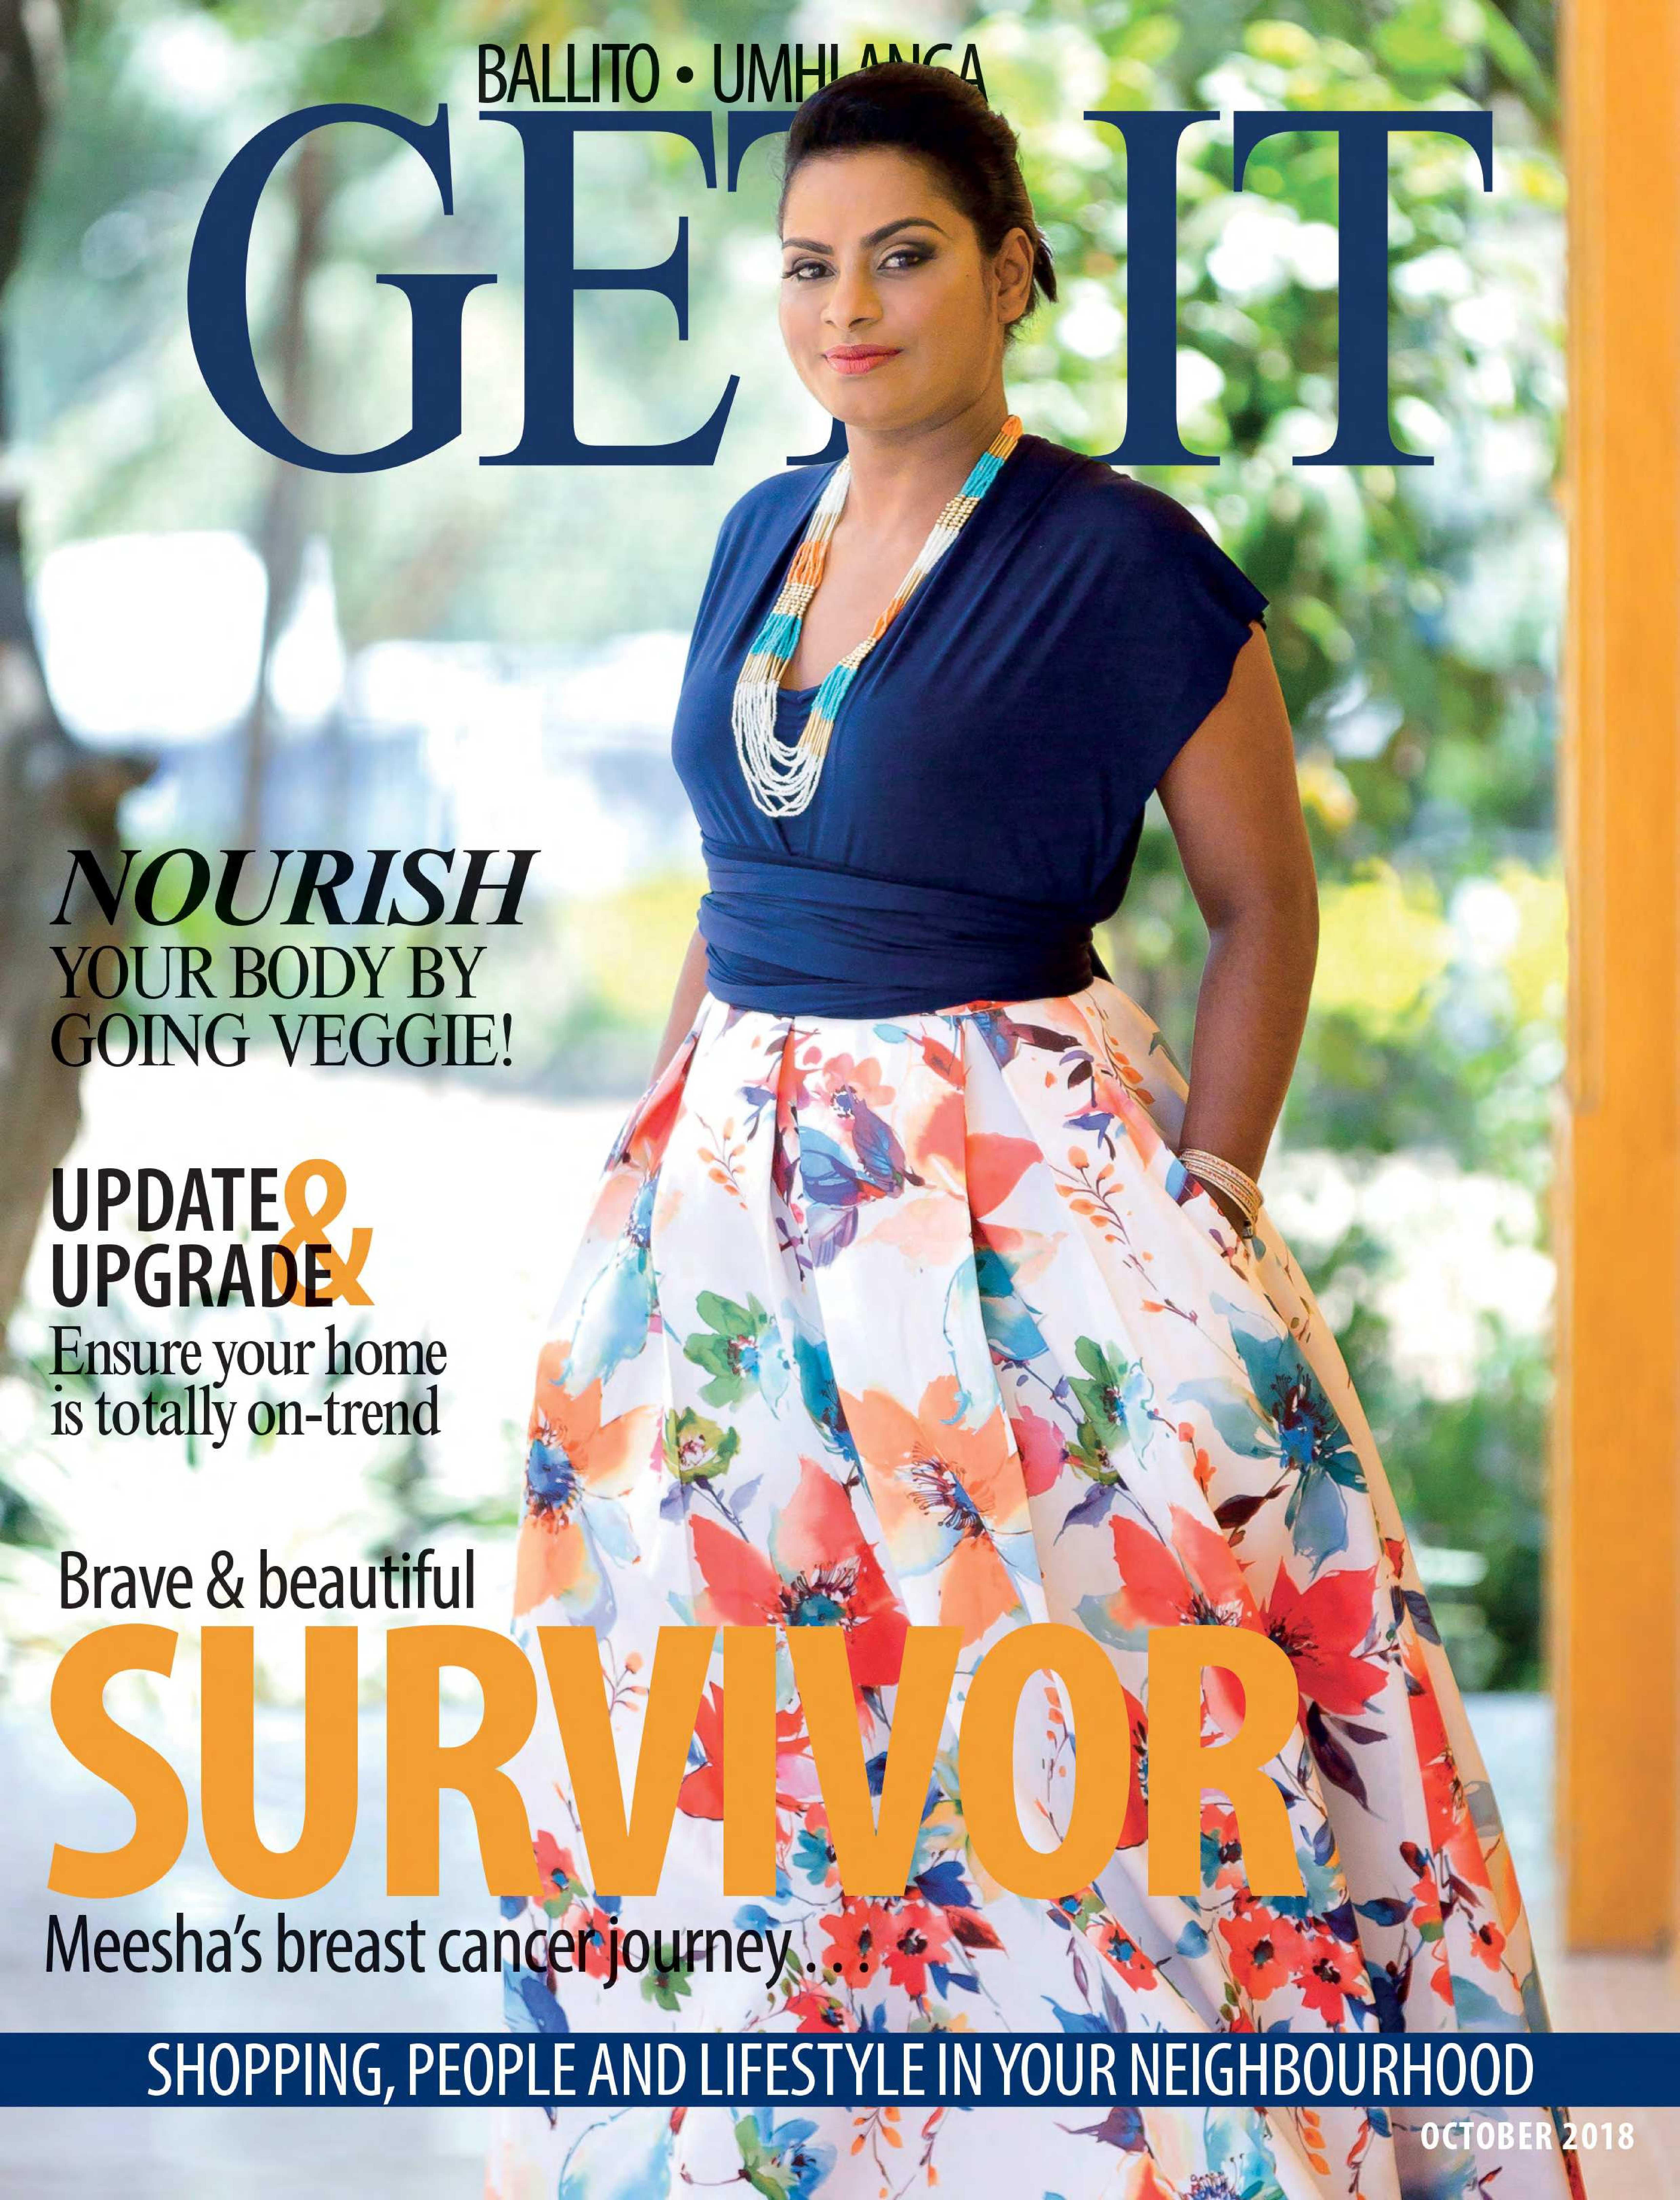 get-magazine-ballitoumhlanga-october-2018-epapers-page-1